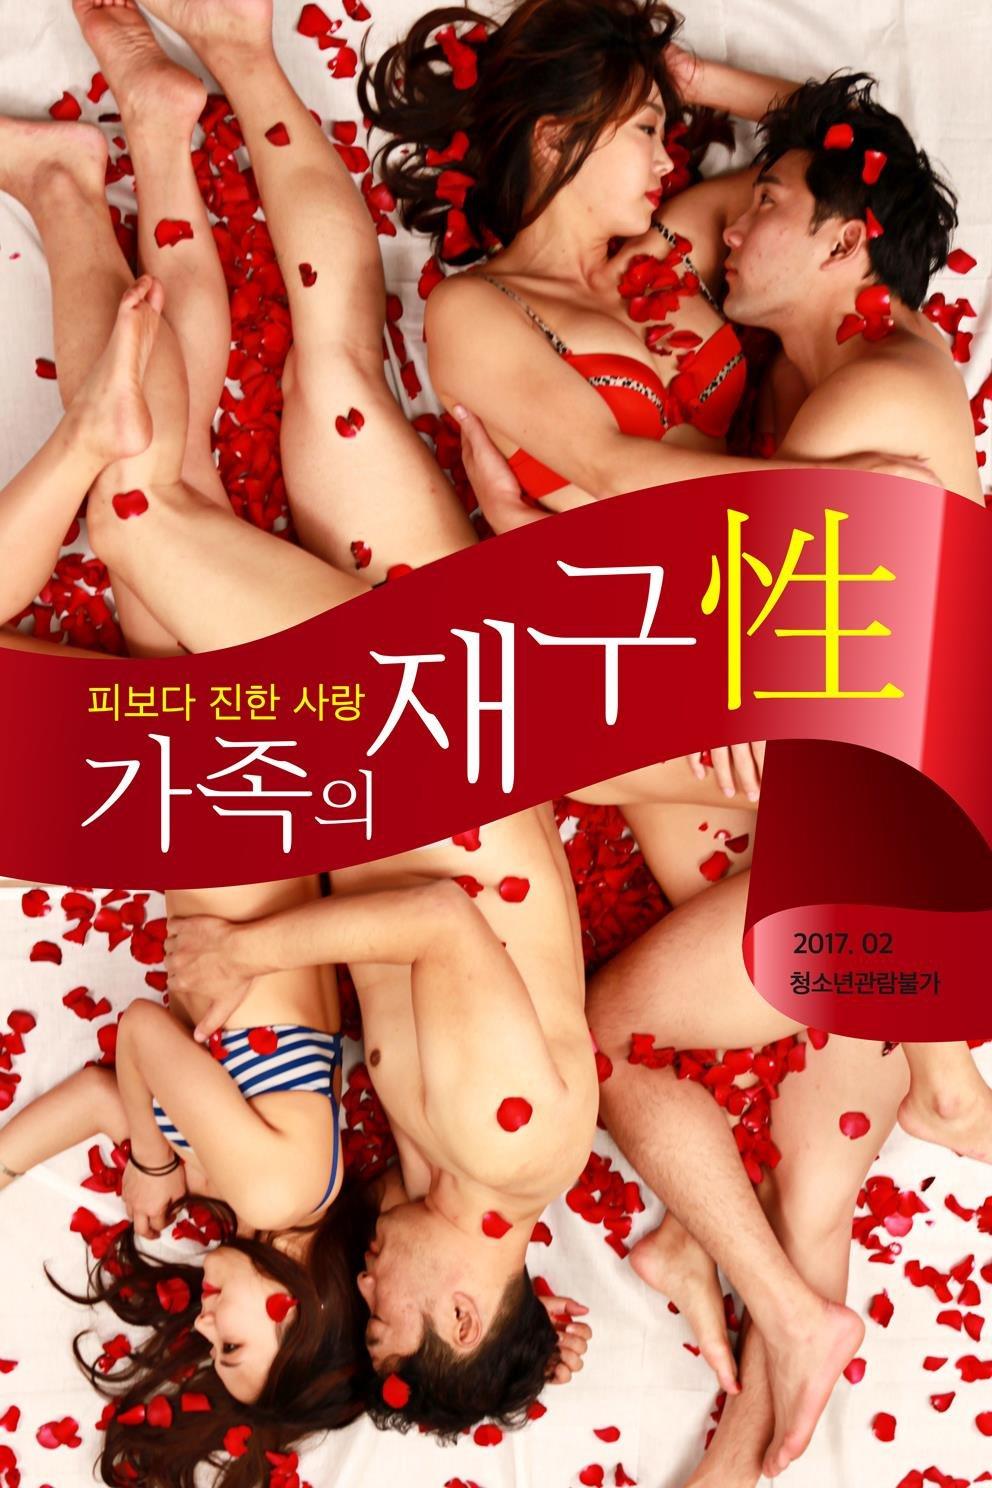 Family Reconstruction Full Korea 18+ Adult Movie Online Free